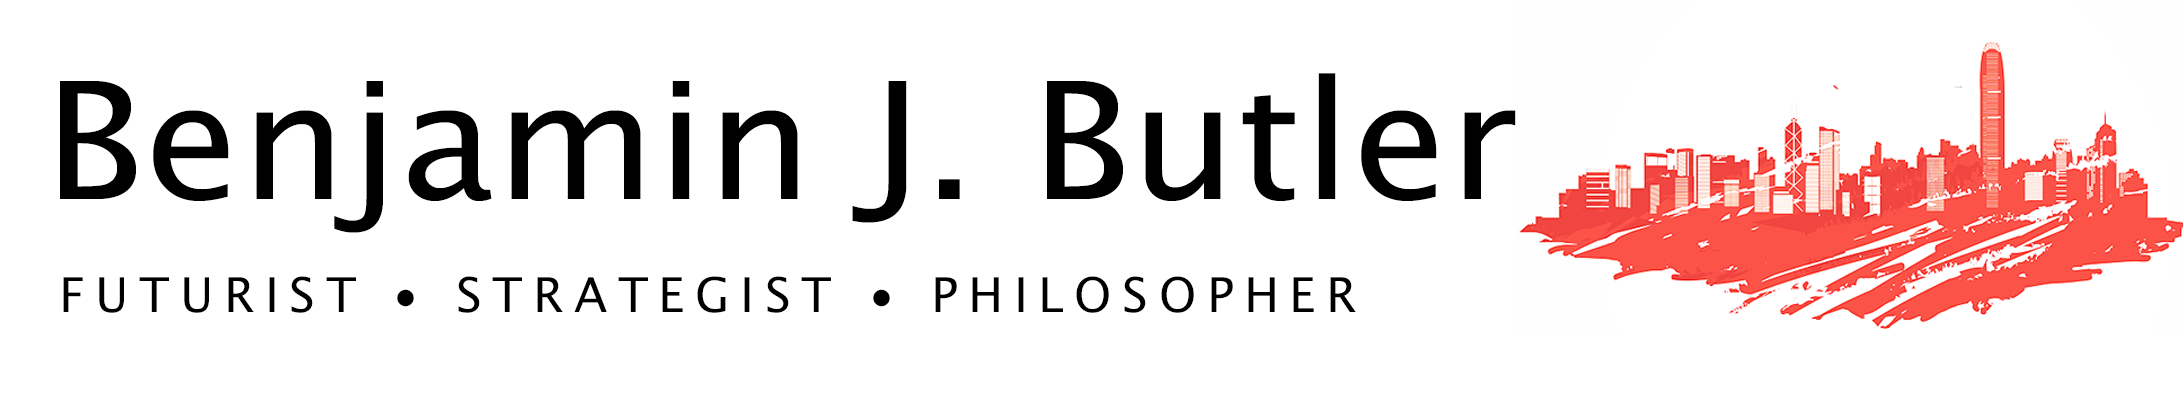 Benjamin J Butler - Futurist